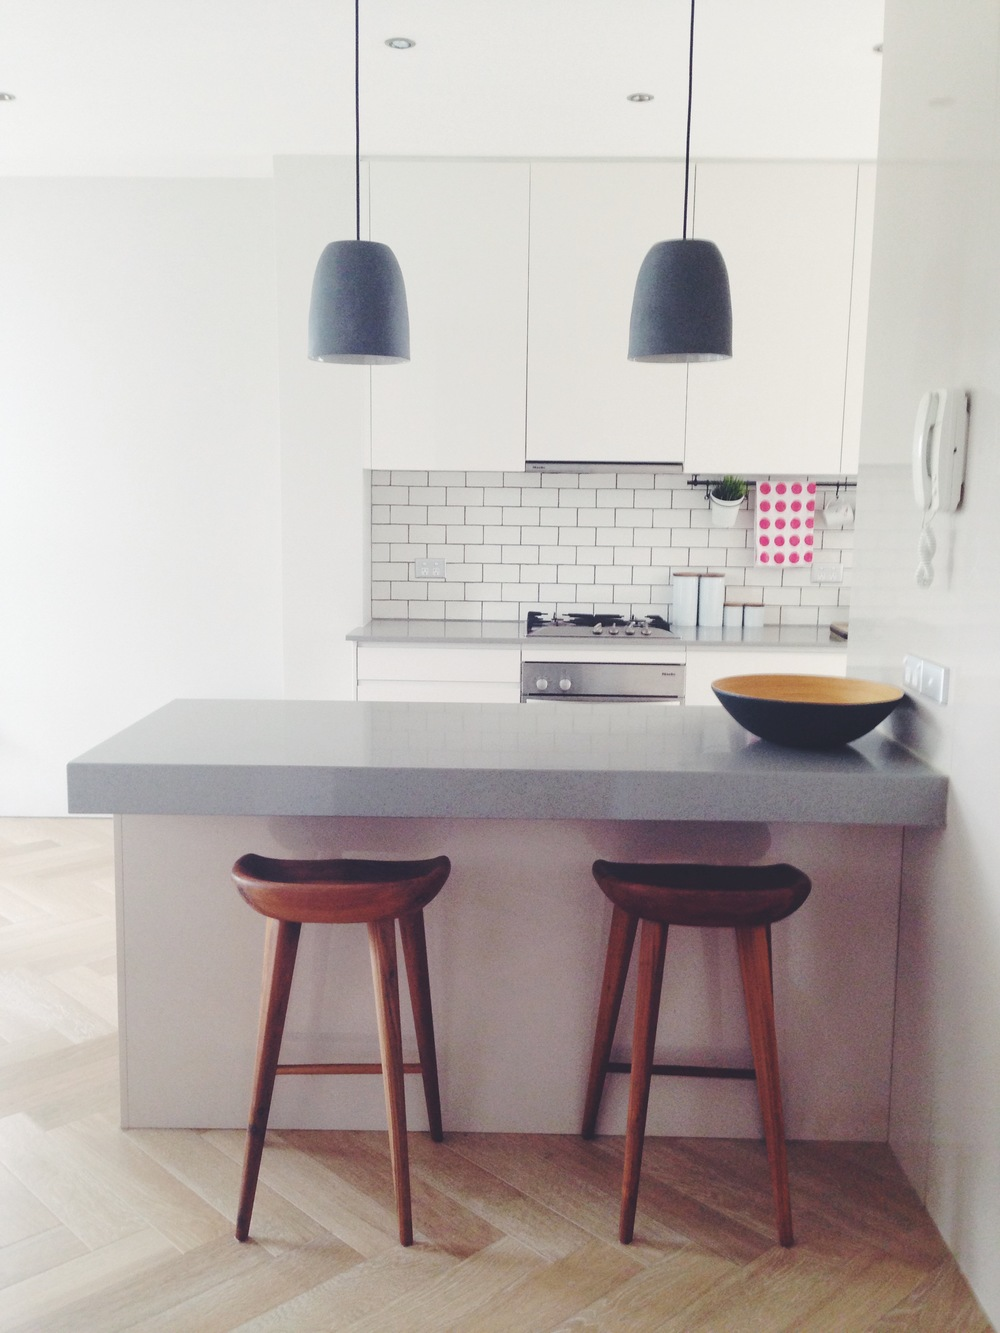 Emily's kitchen. Pendants from Mud Australia